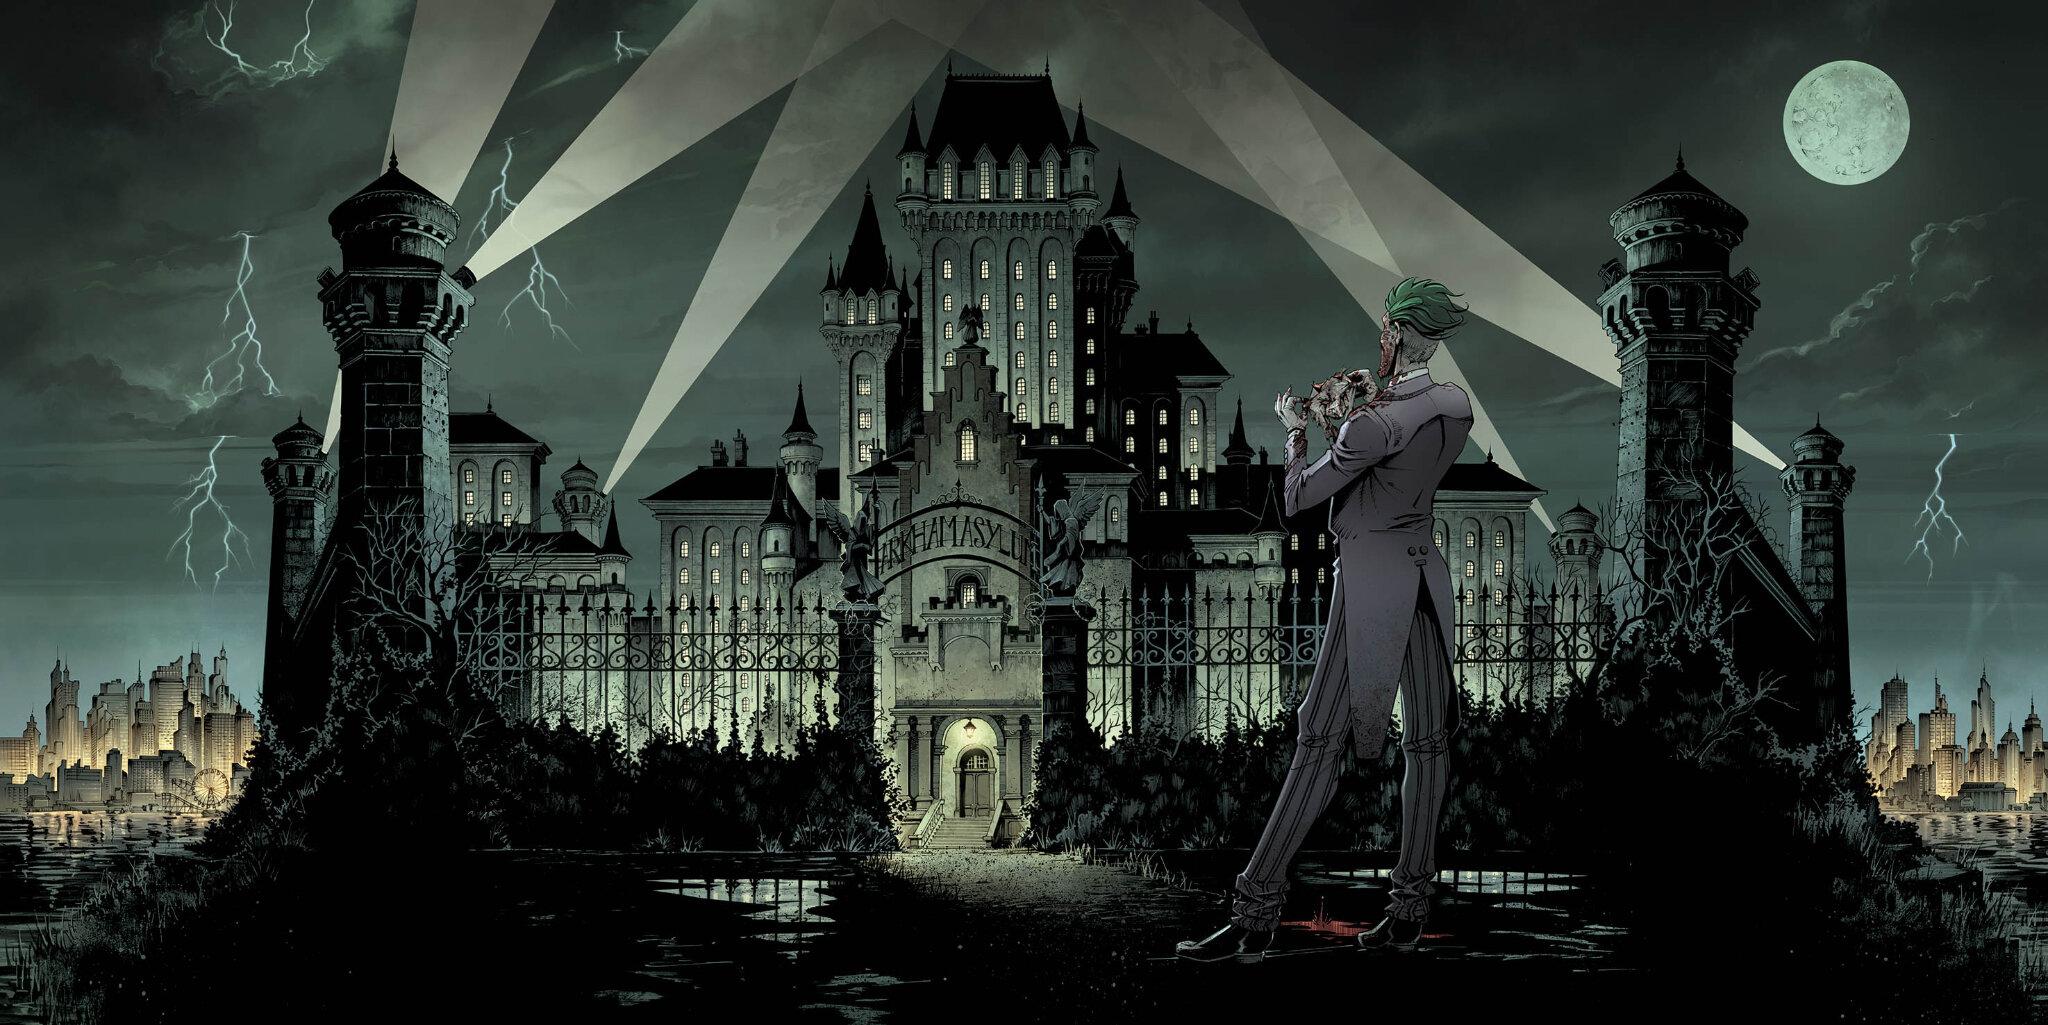 Arkham_Asylum_colo_final